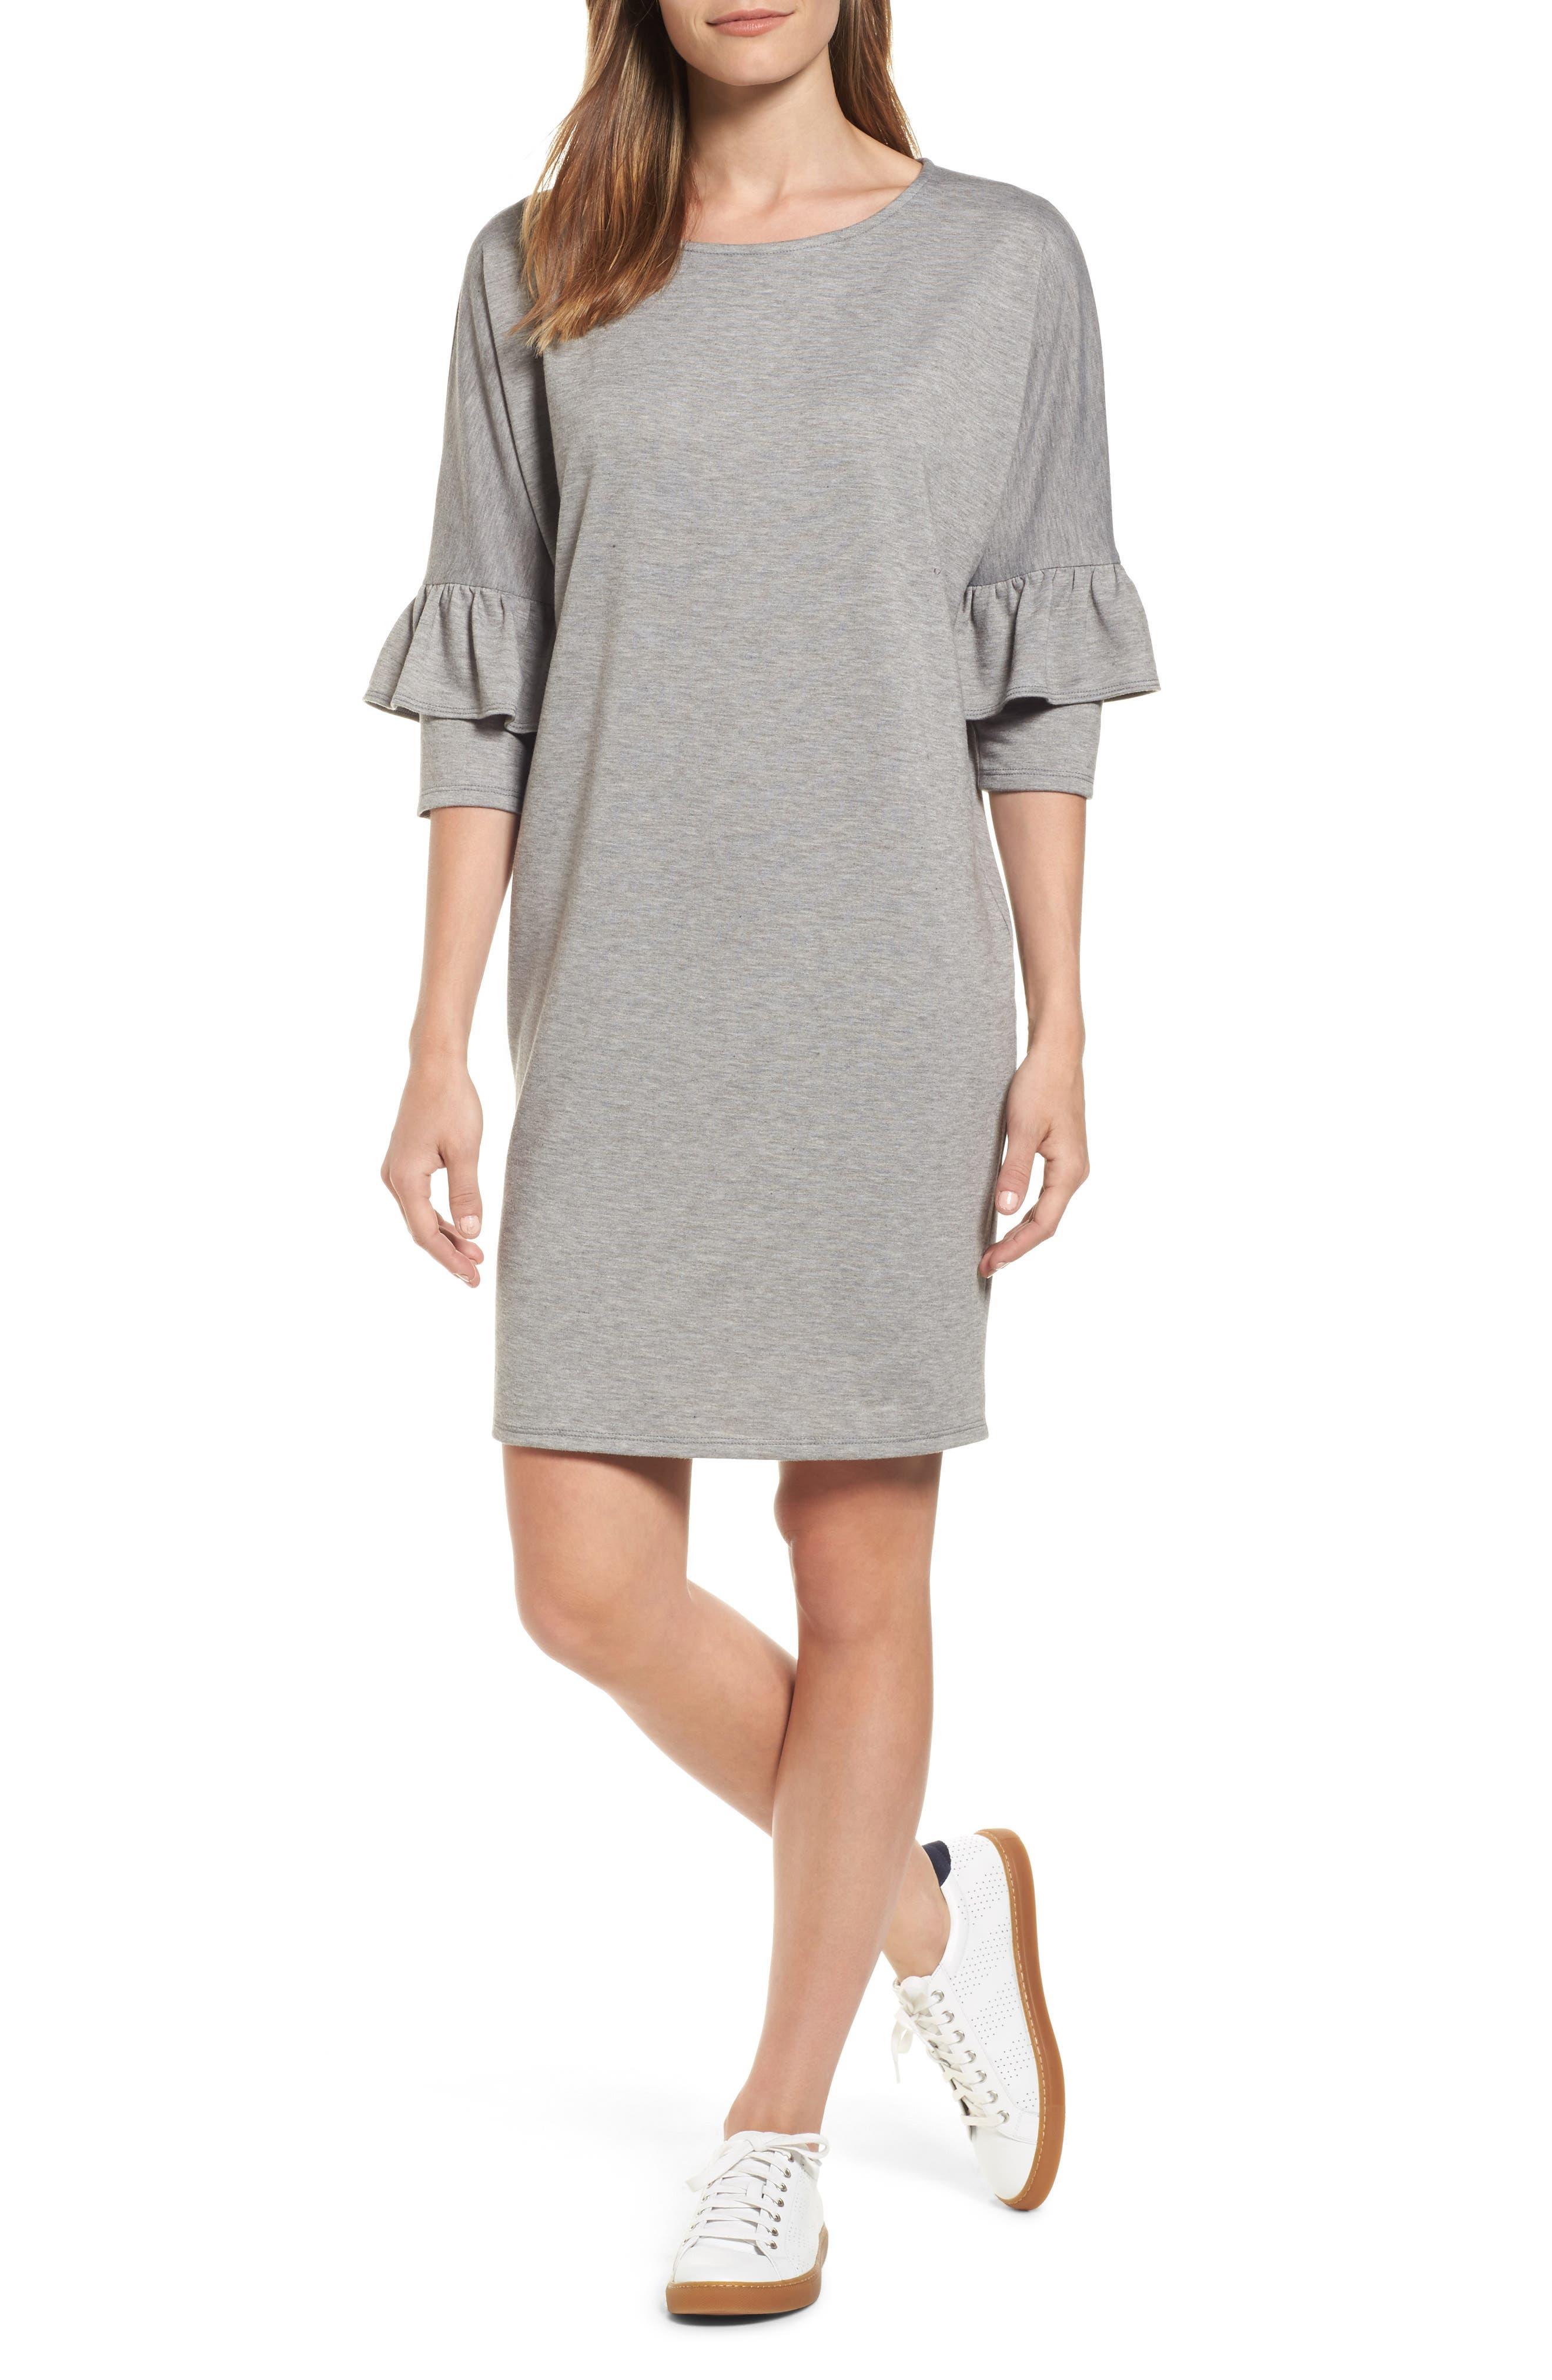 Alternate Image 1 Selected - Bobeau Ruffle Sleeve Tunic Dress (Regular & Petite)